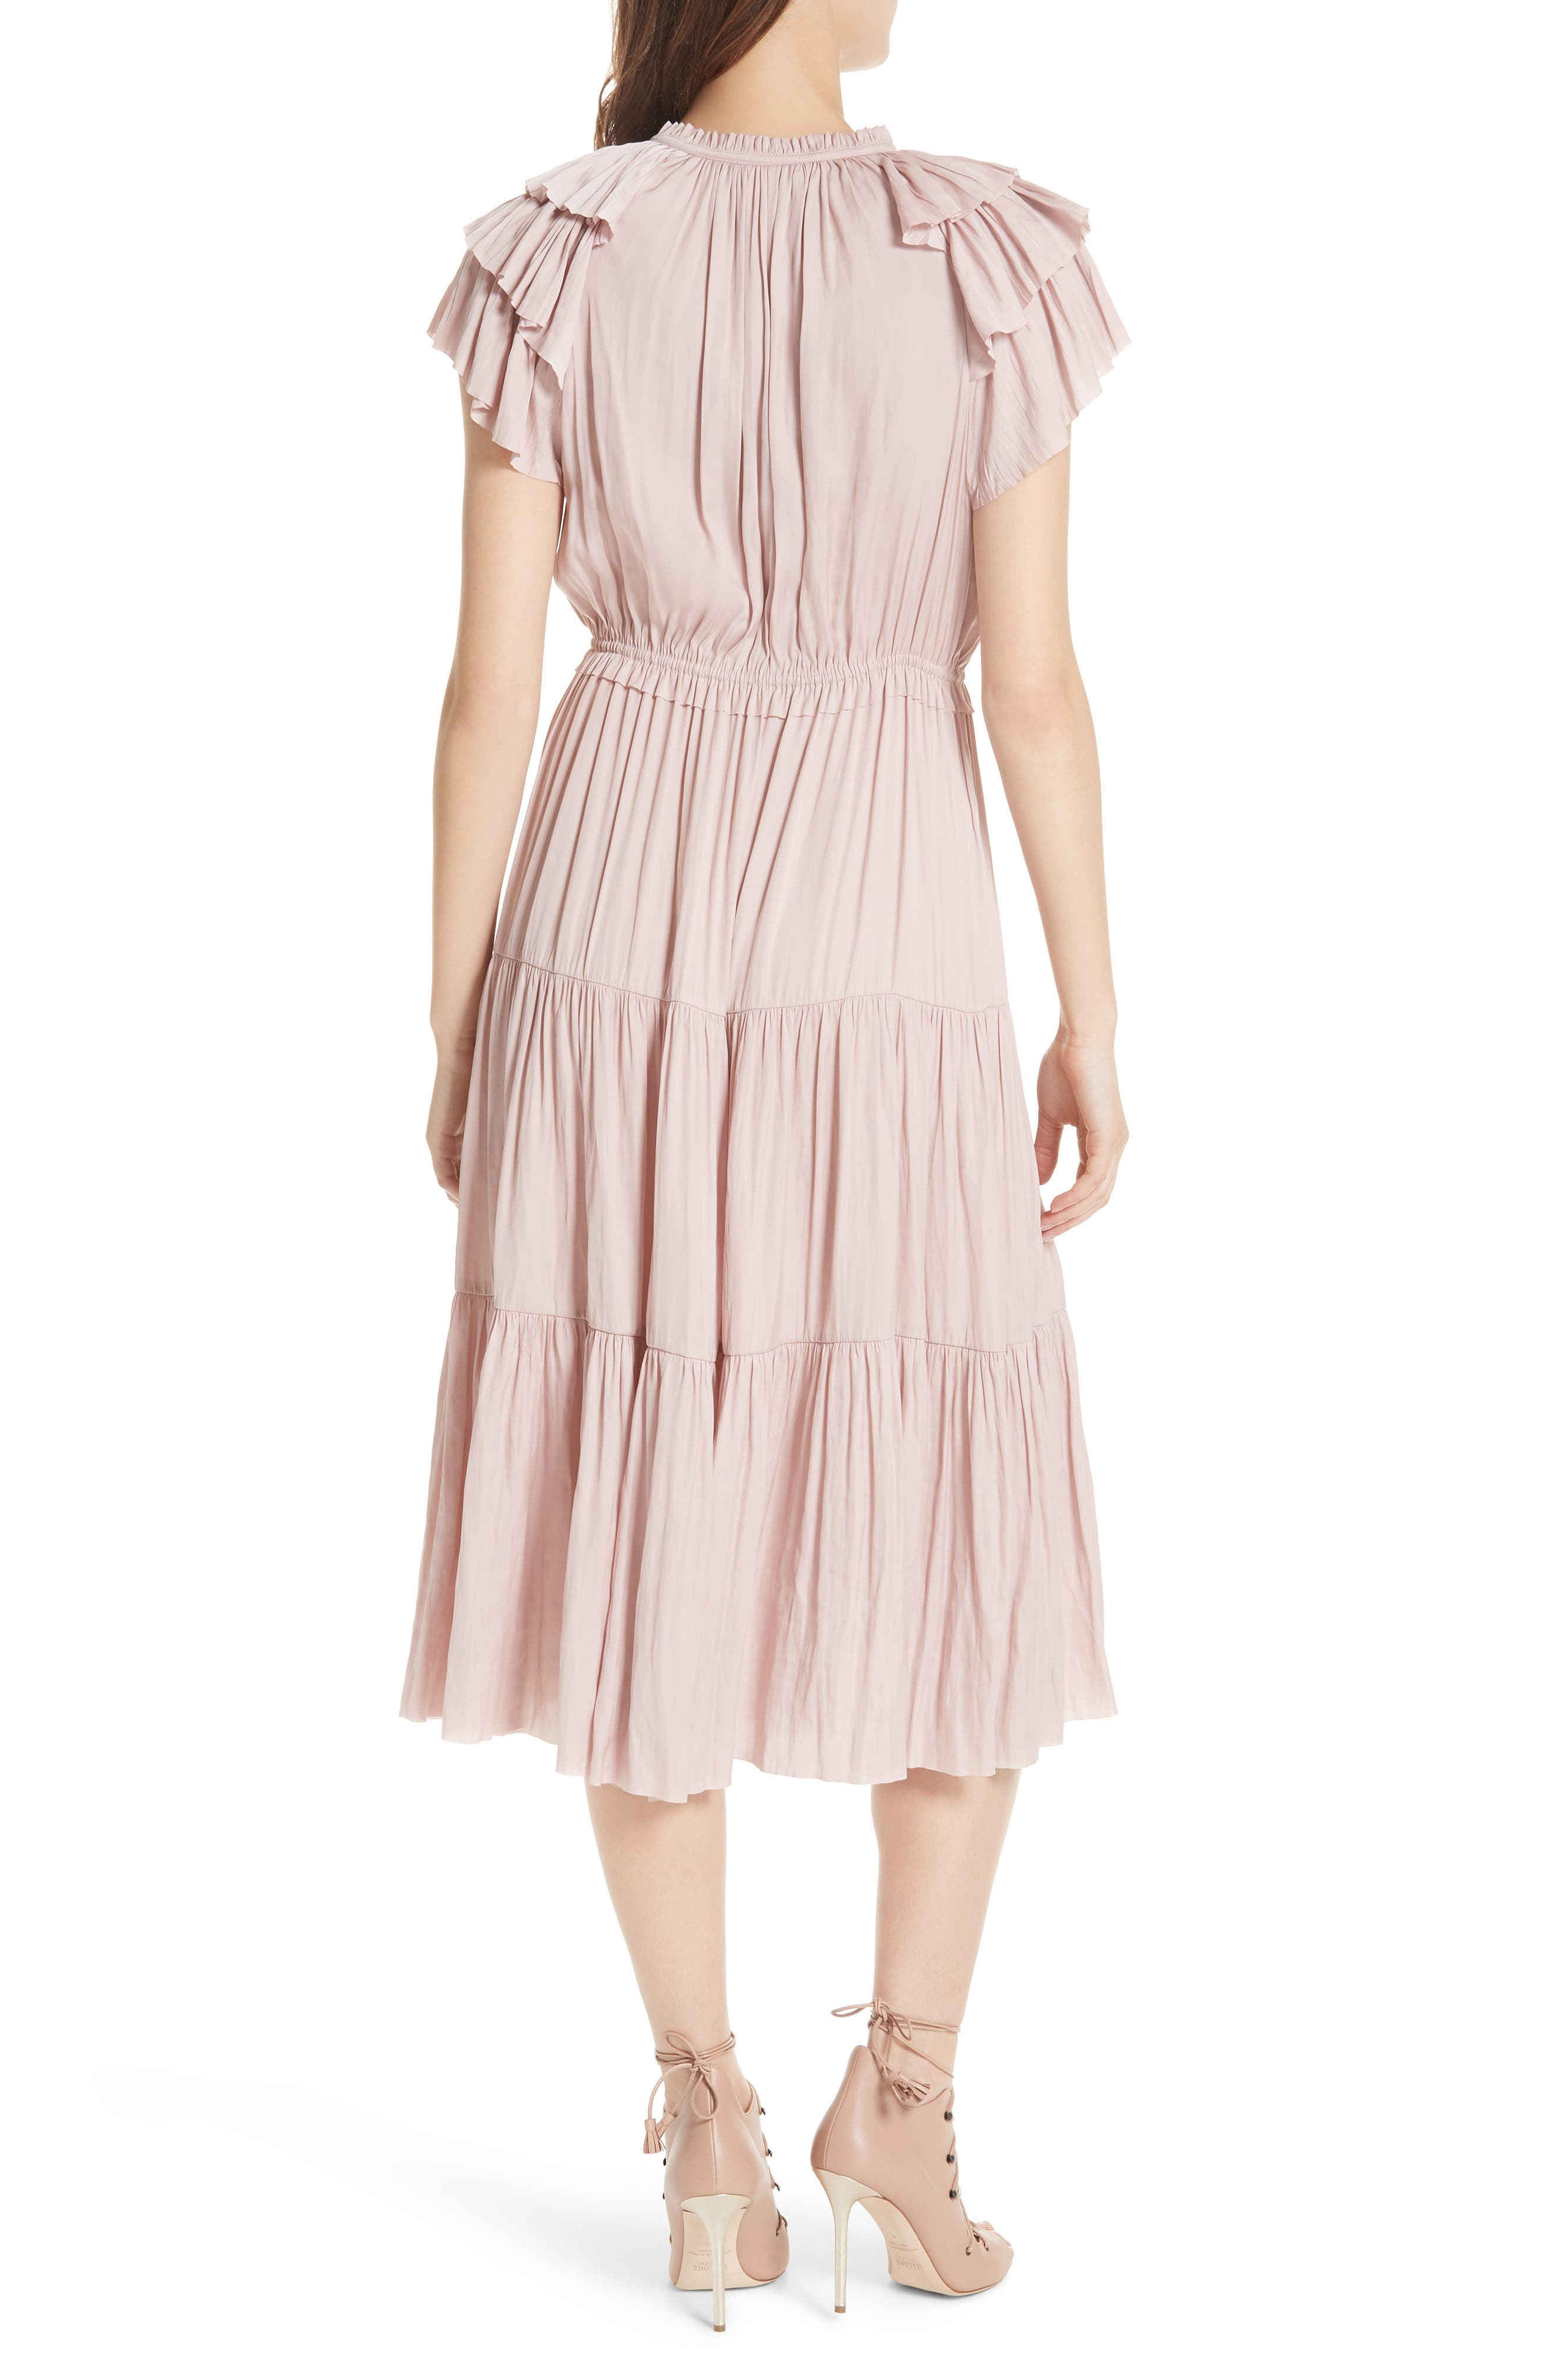 ULLA JOHNSON,                             Blaire Satin Dress,                             Alternate thumbnail 2, color,                             600